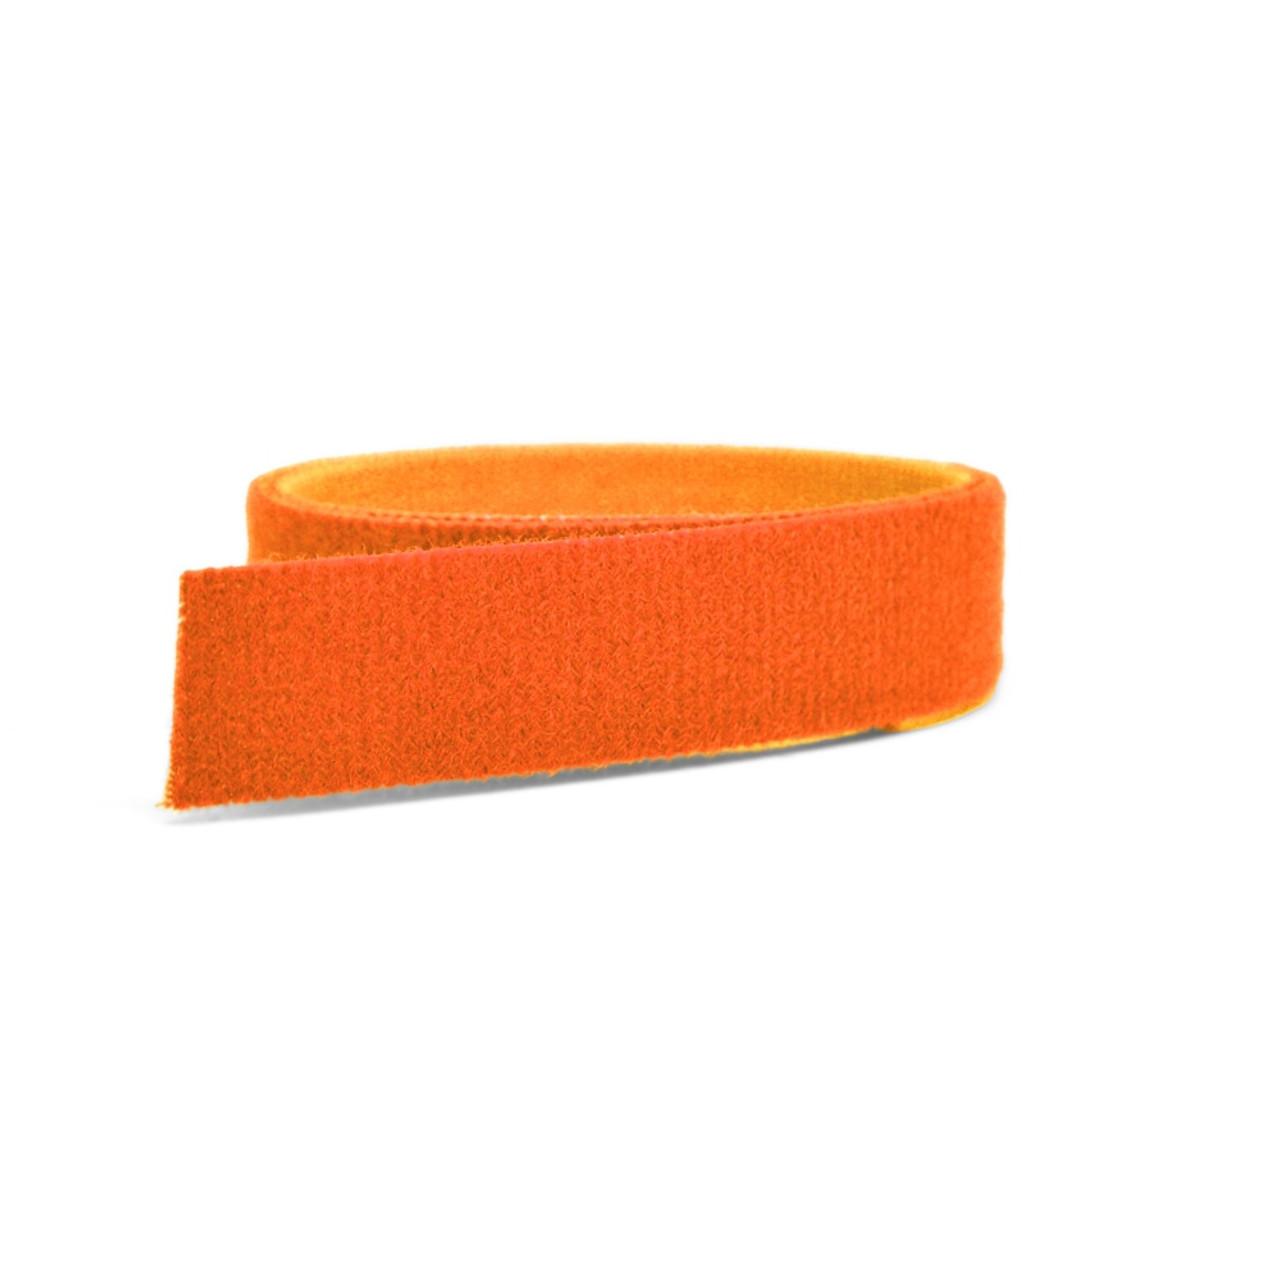 VELCRO® ONE-WRAP® Tape - Orange / Velcro Straps - Bundling Straps - Velcro Tie - Velcro Strap